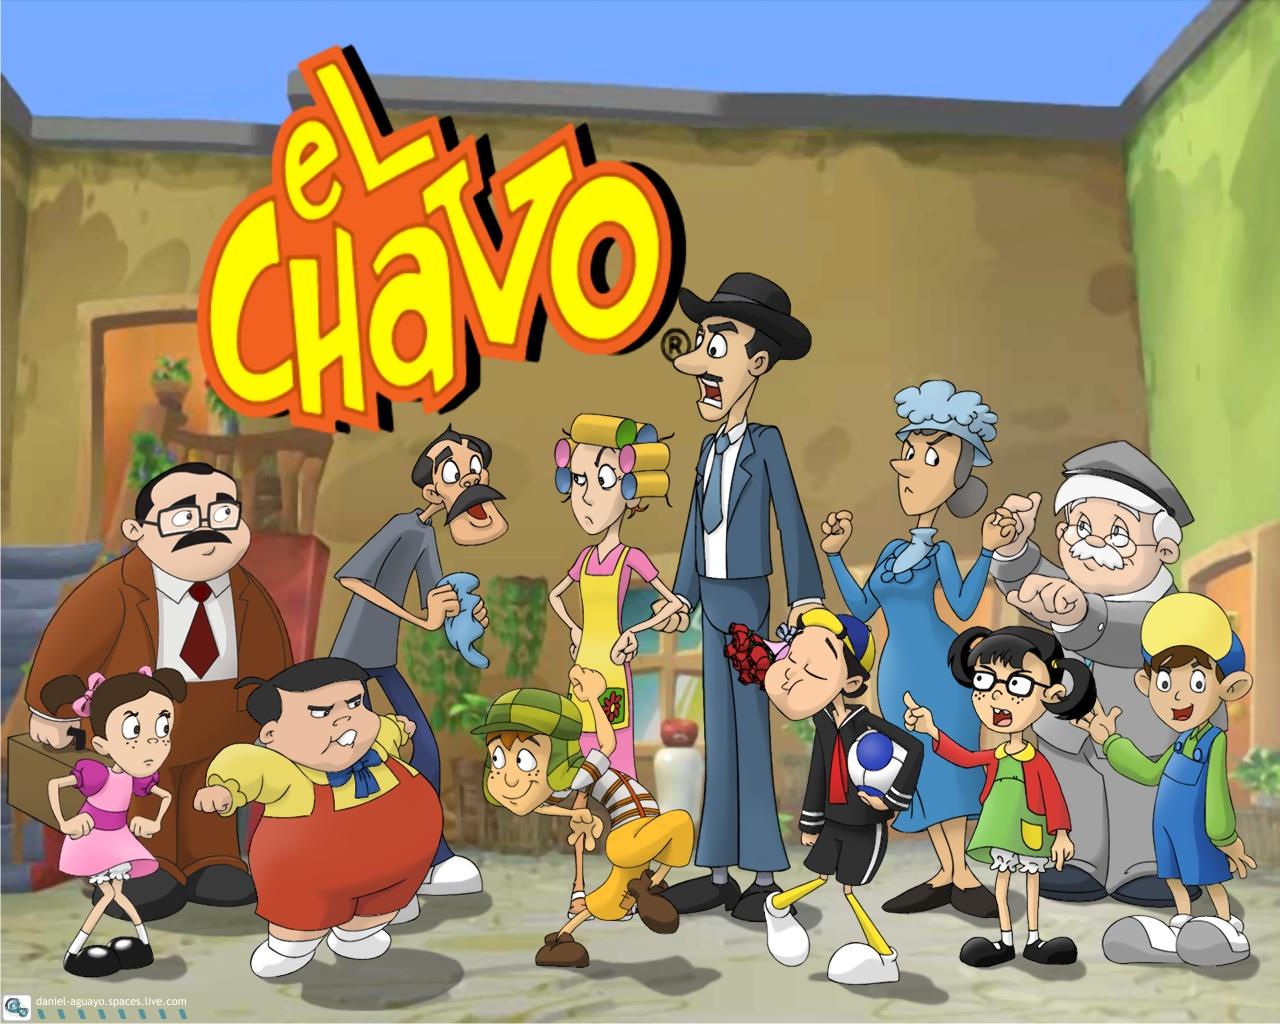 Chavo+del+ocho+quico